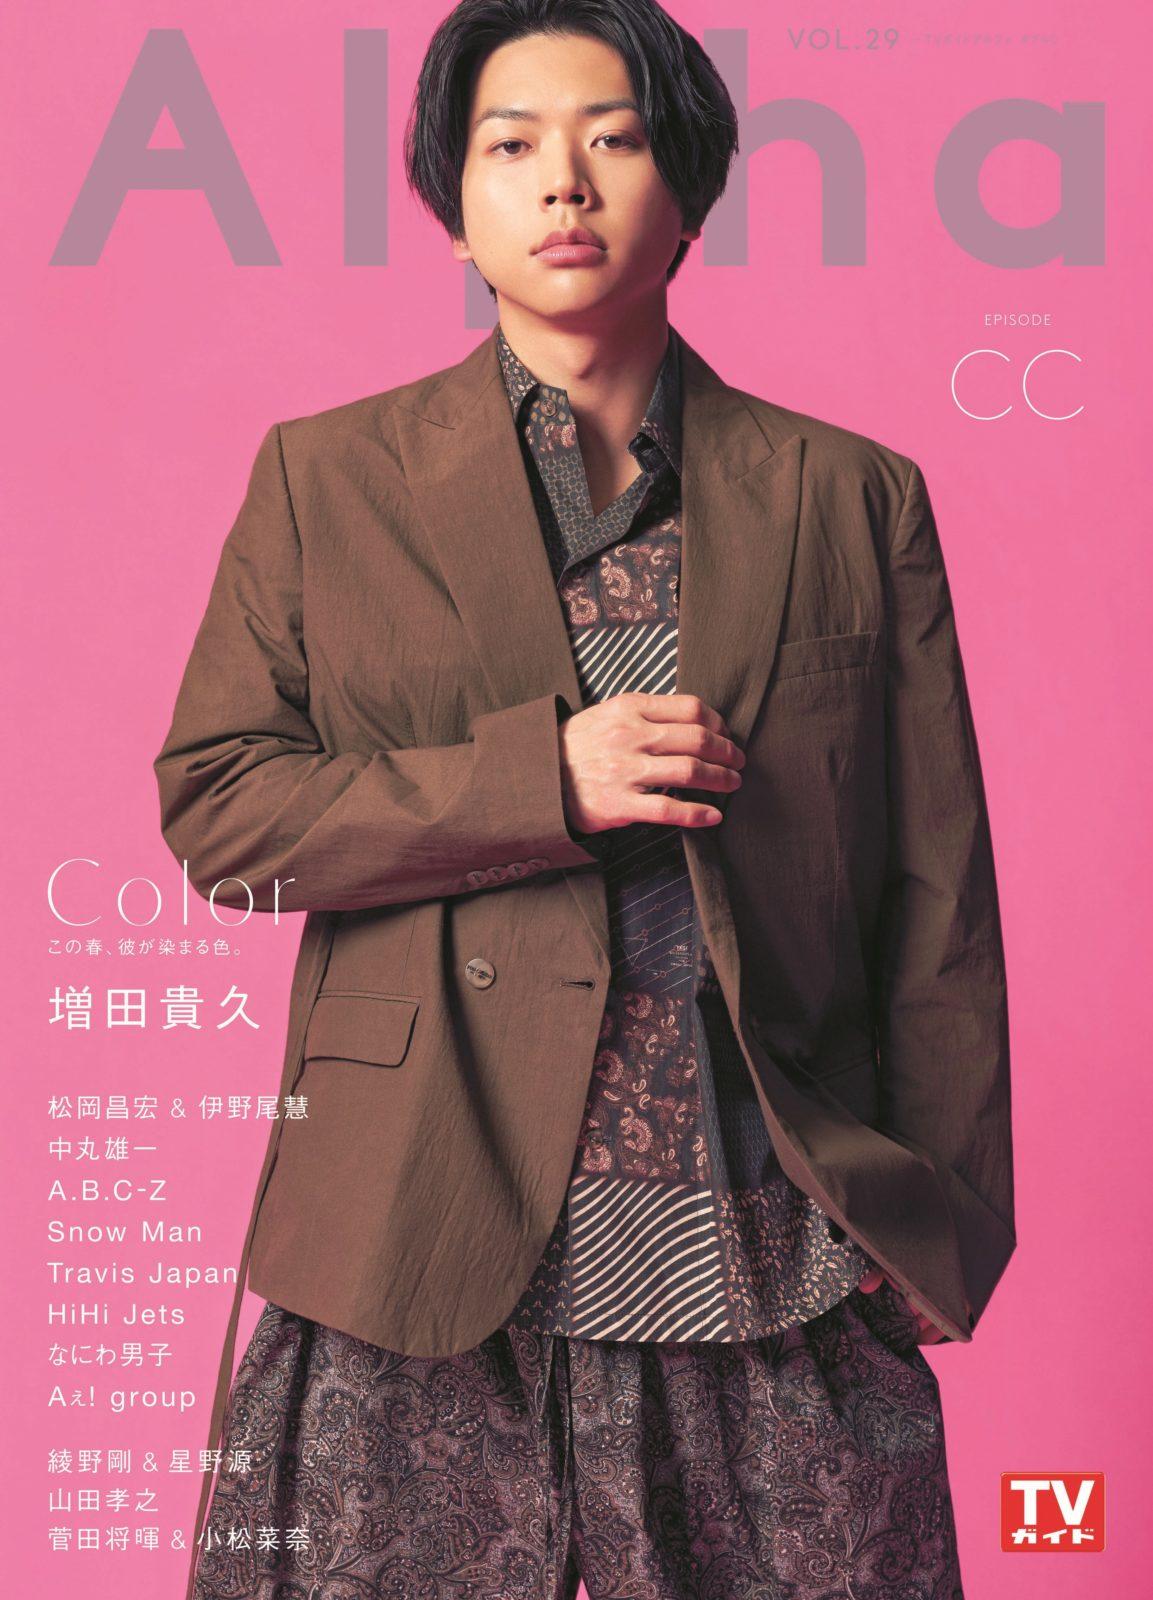 NEWS増田貴久、ピンク背景が鮮やかなソロ表紙を公開サムネイル画像